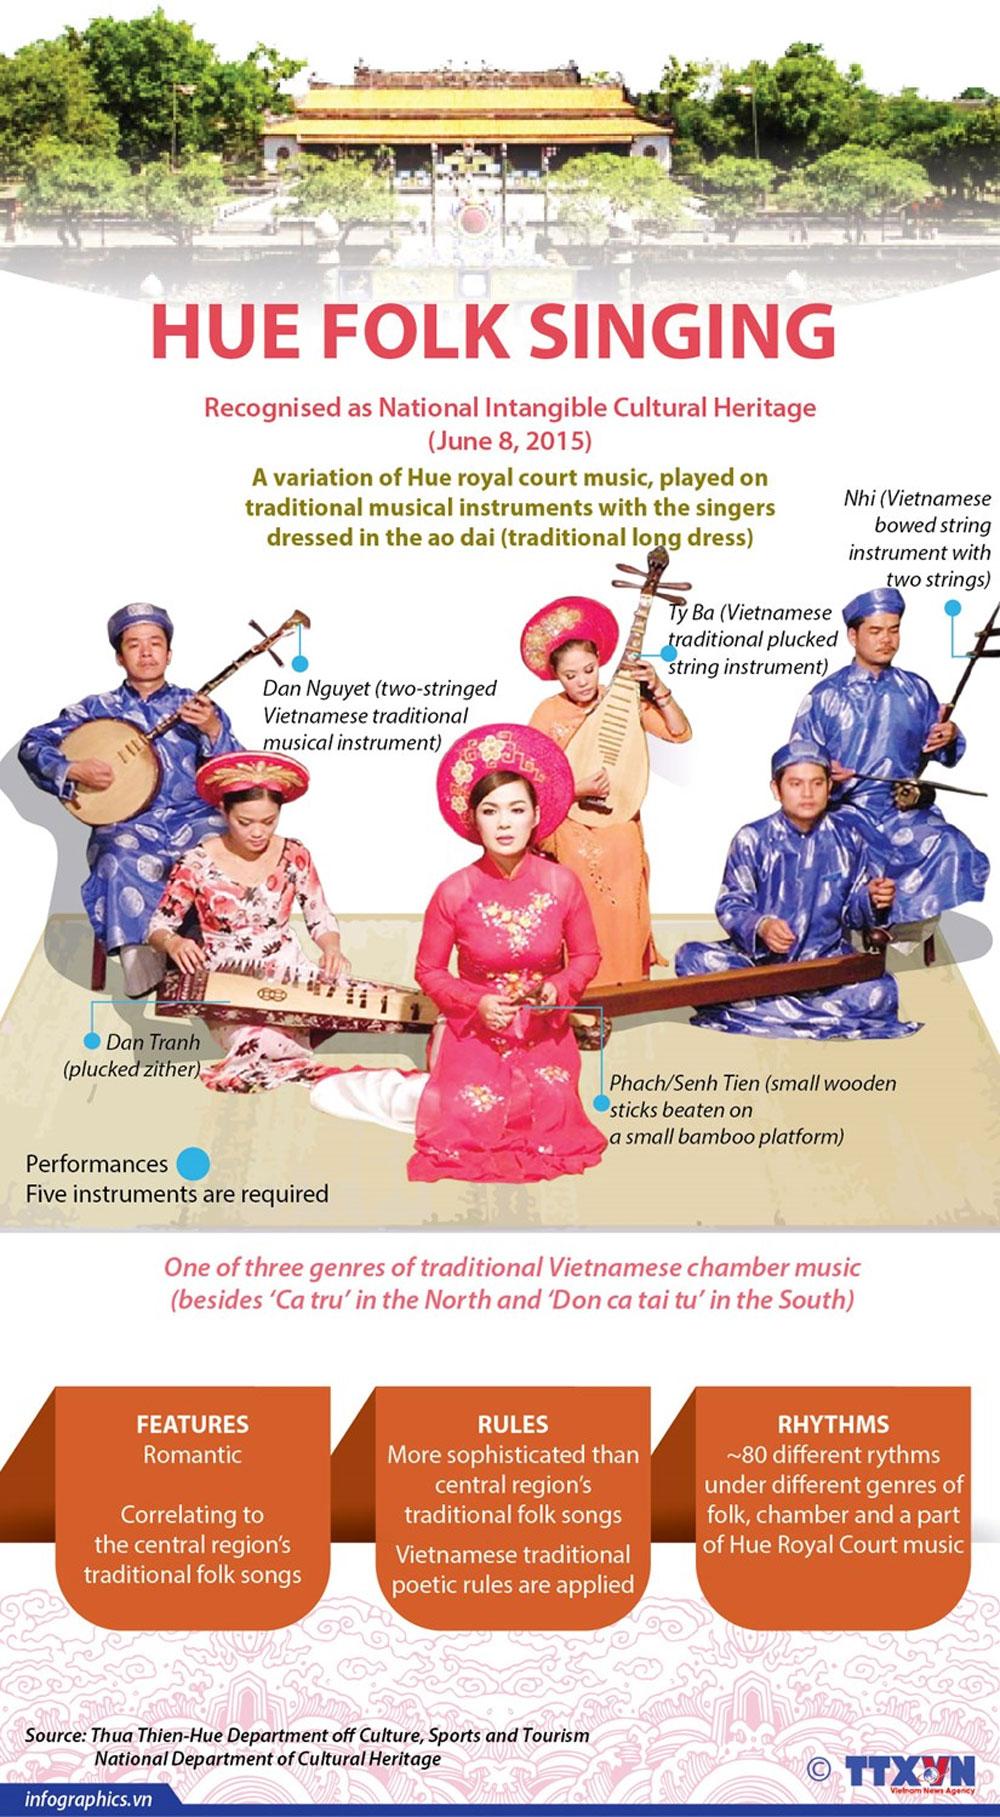 Hue folk singing, Hue royal court music, traditional musical instruments, traditional long dress